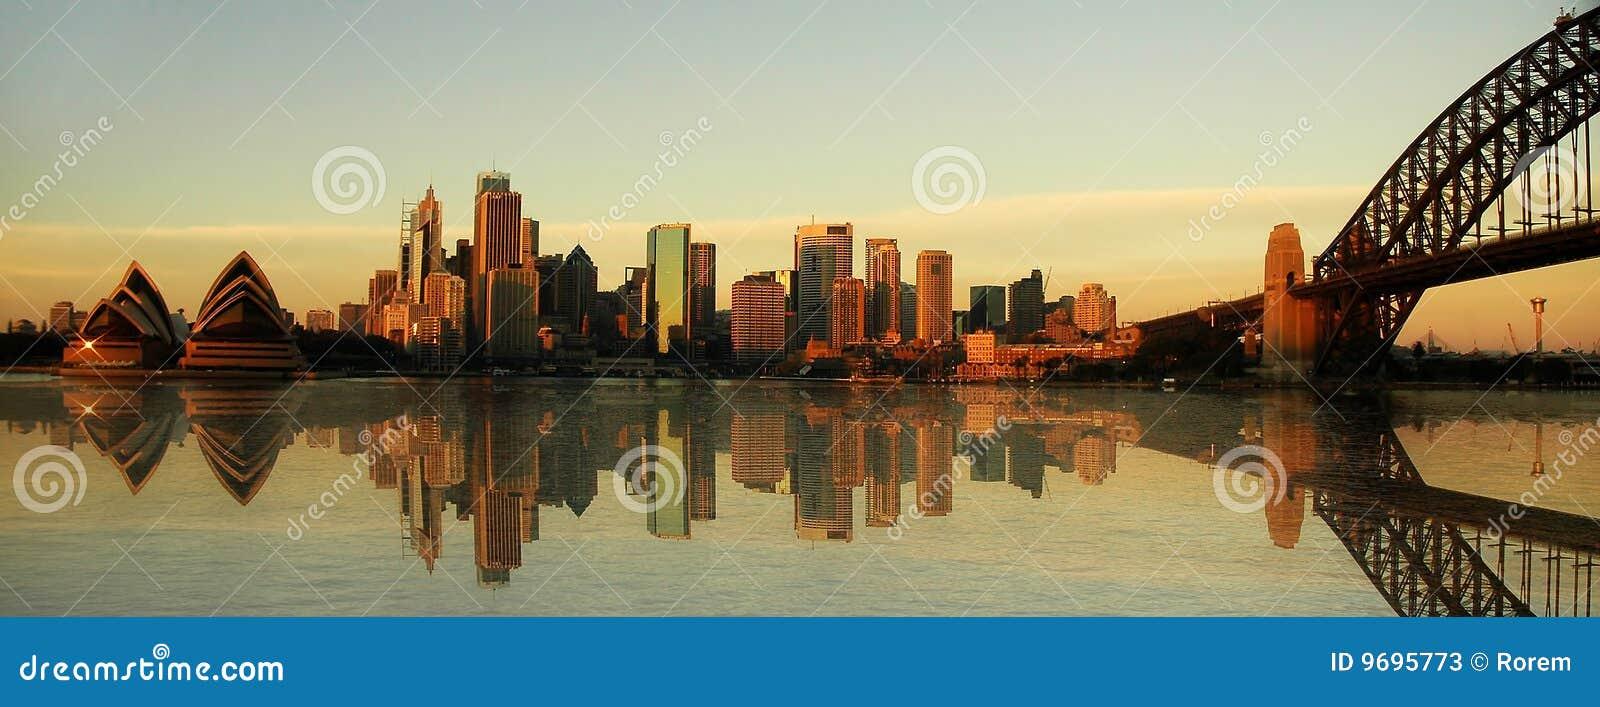 Sydney-Grenzsteinpanorama